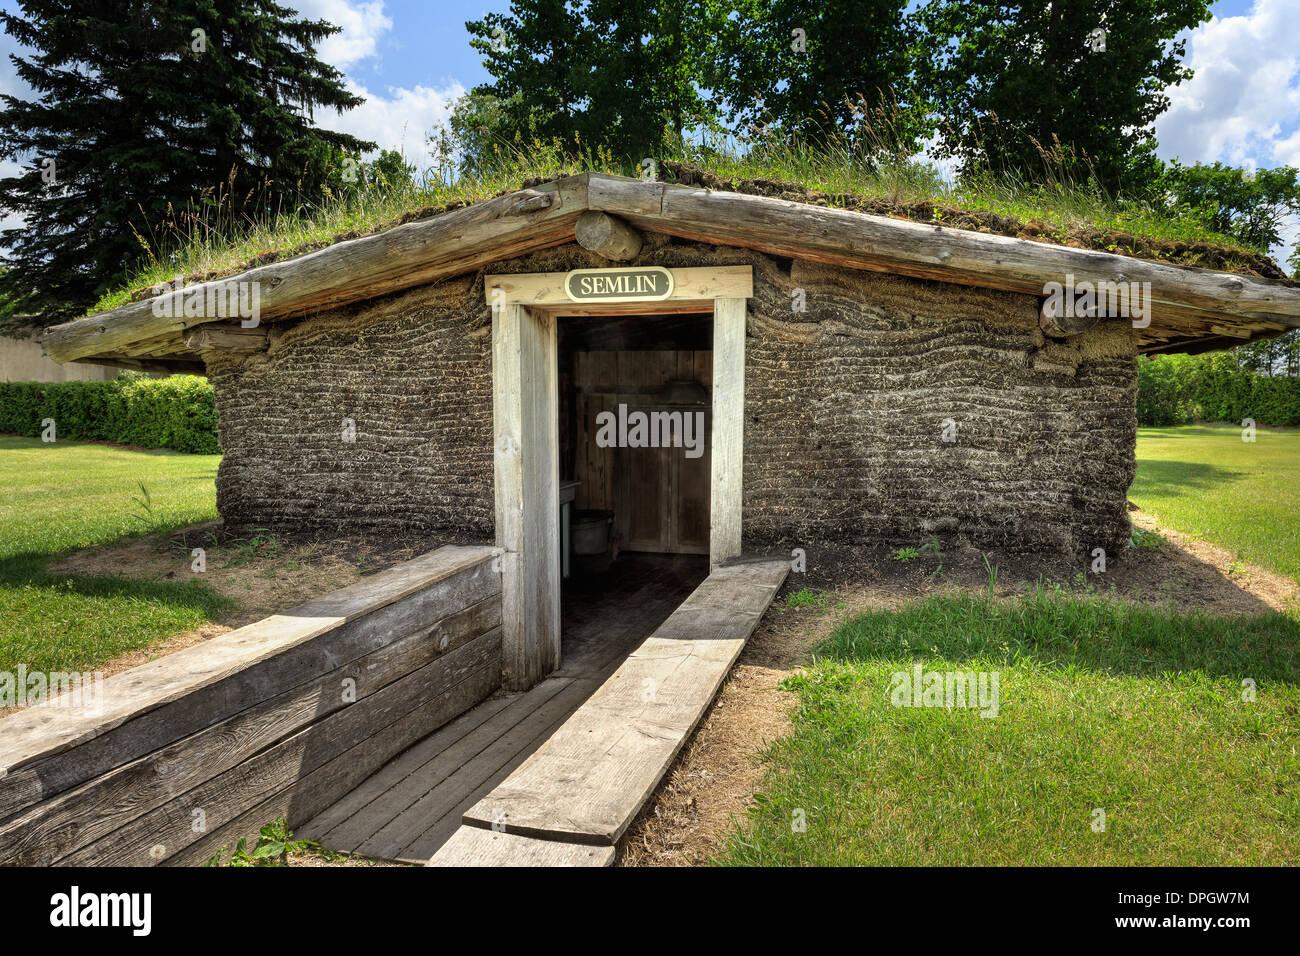 Sod house of pioneers or Semlin, Mennonite Heritage Village, Steinbach, Manitoba, Canada - Stock Image